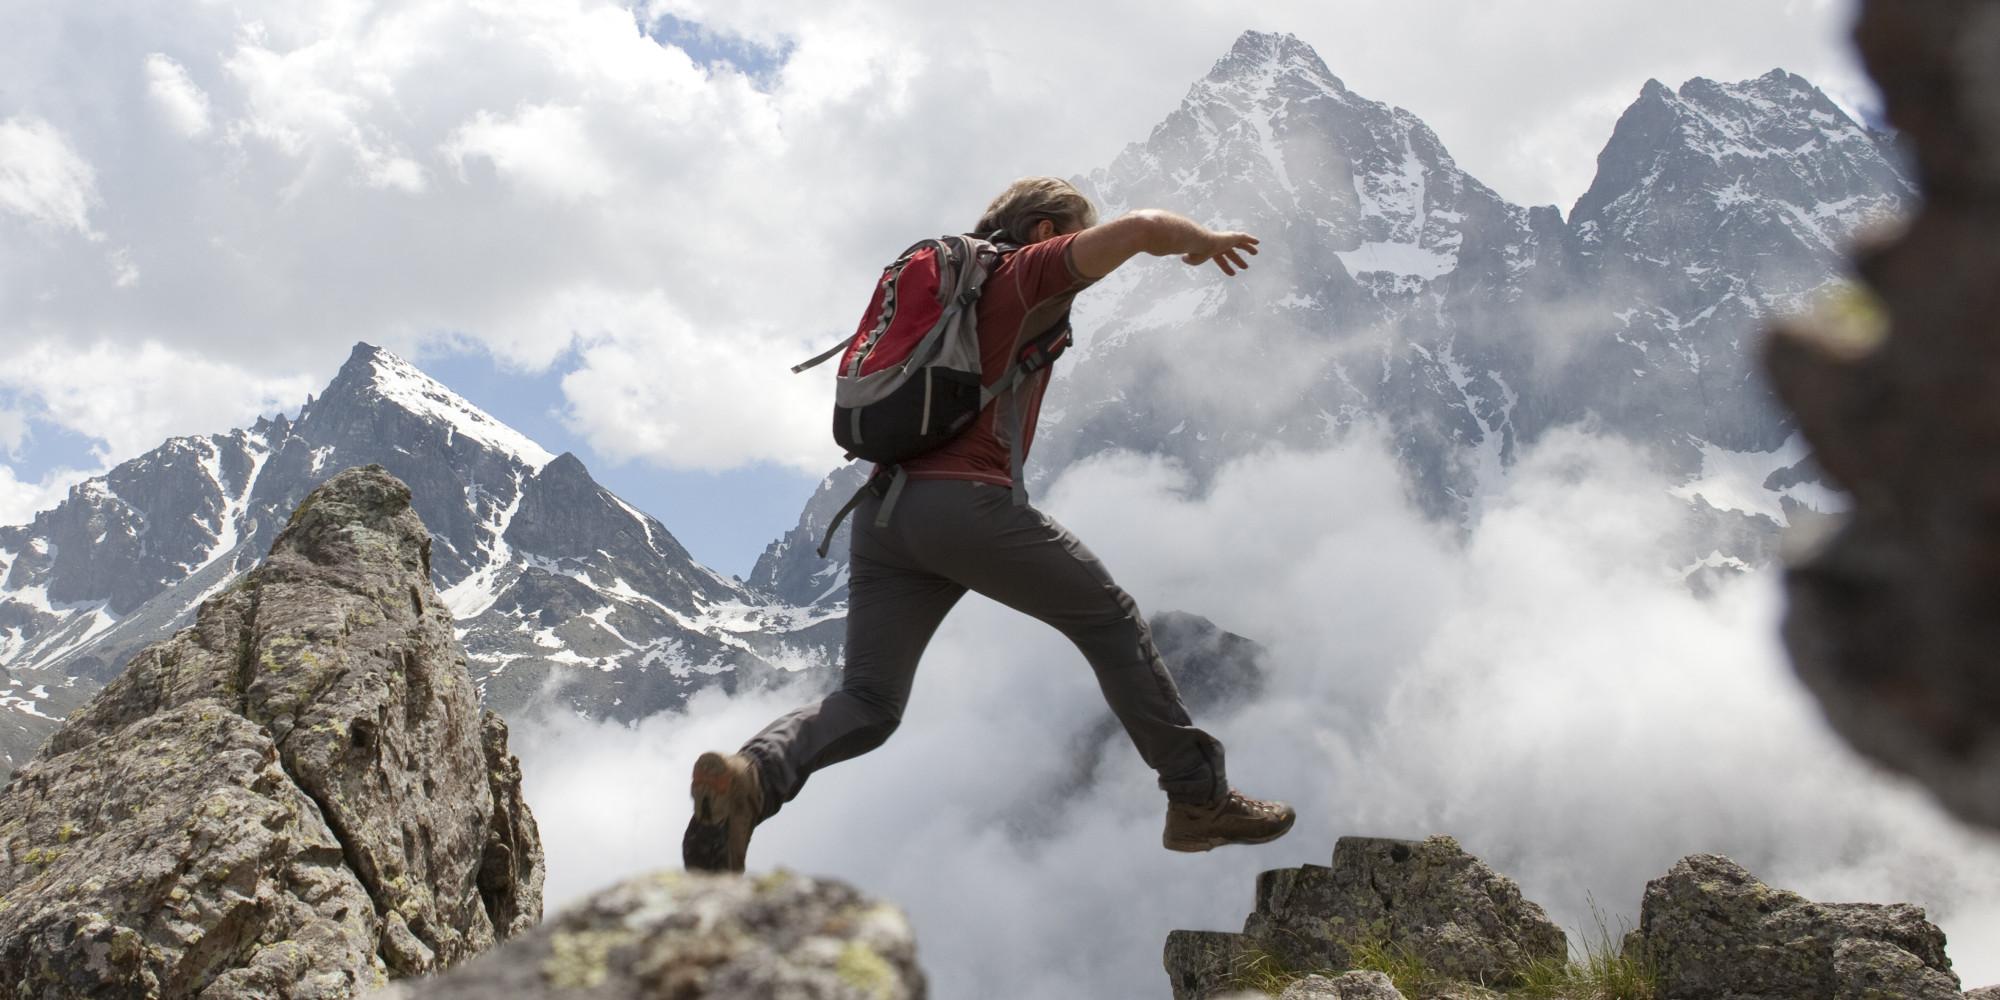 Choose Your Own Tour Adventure Treks to Machu Picchu